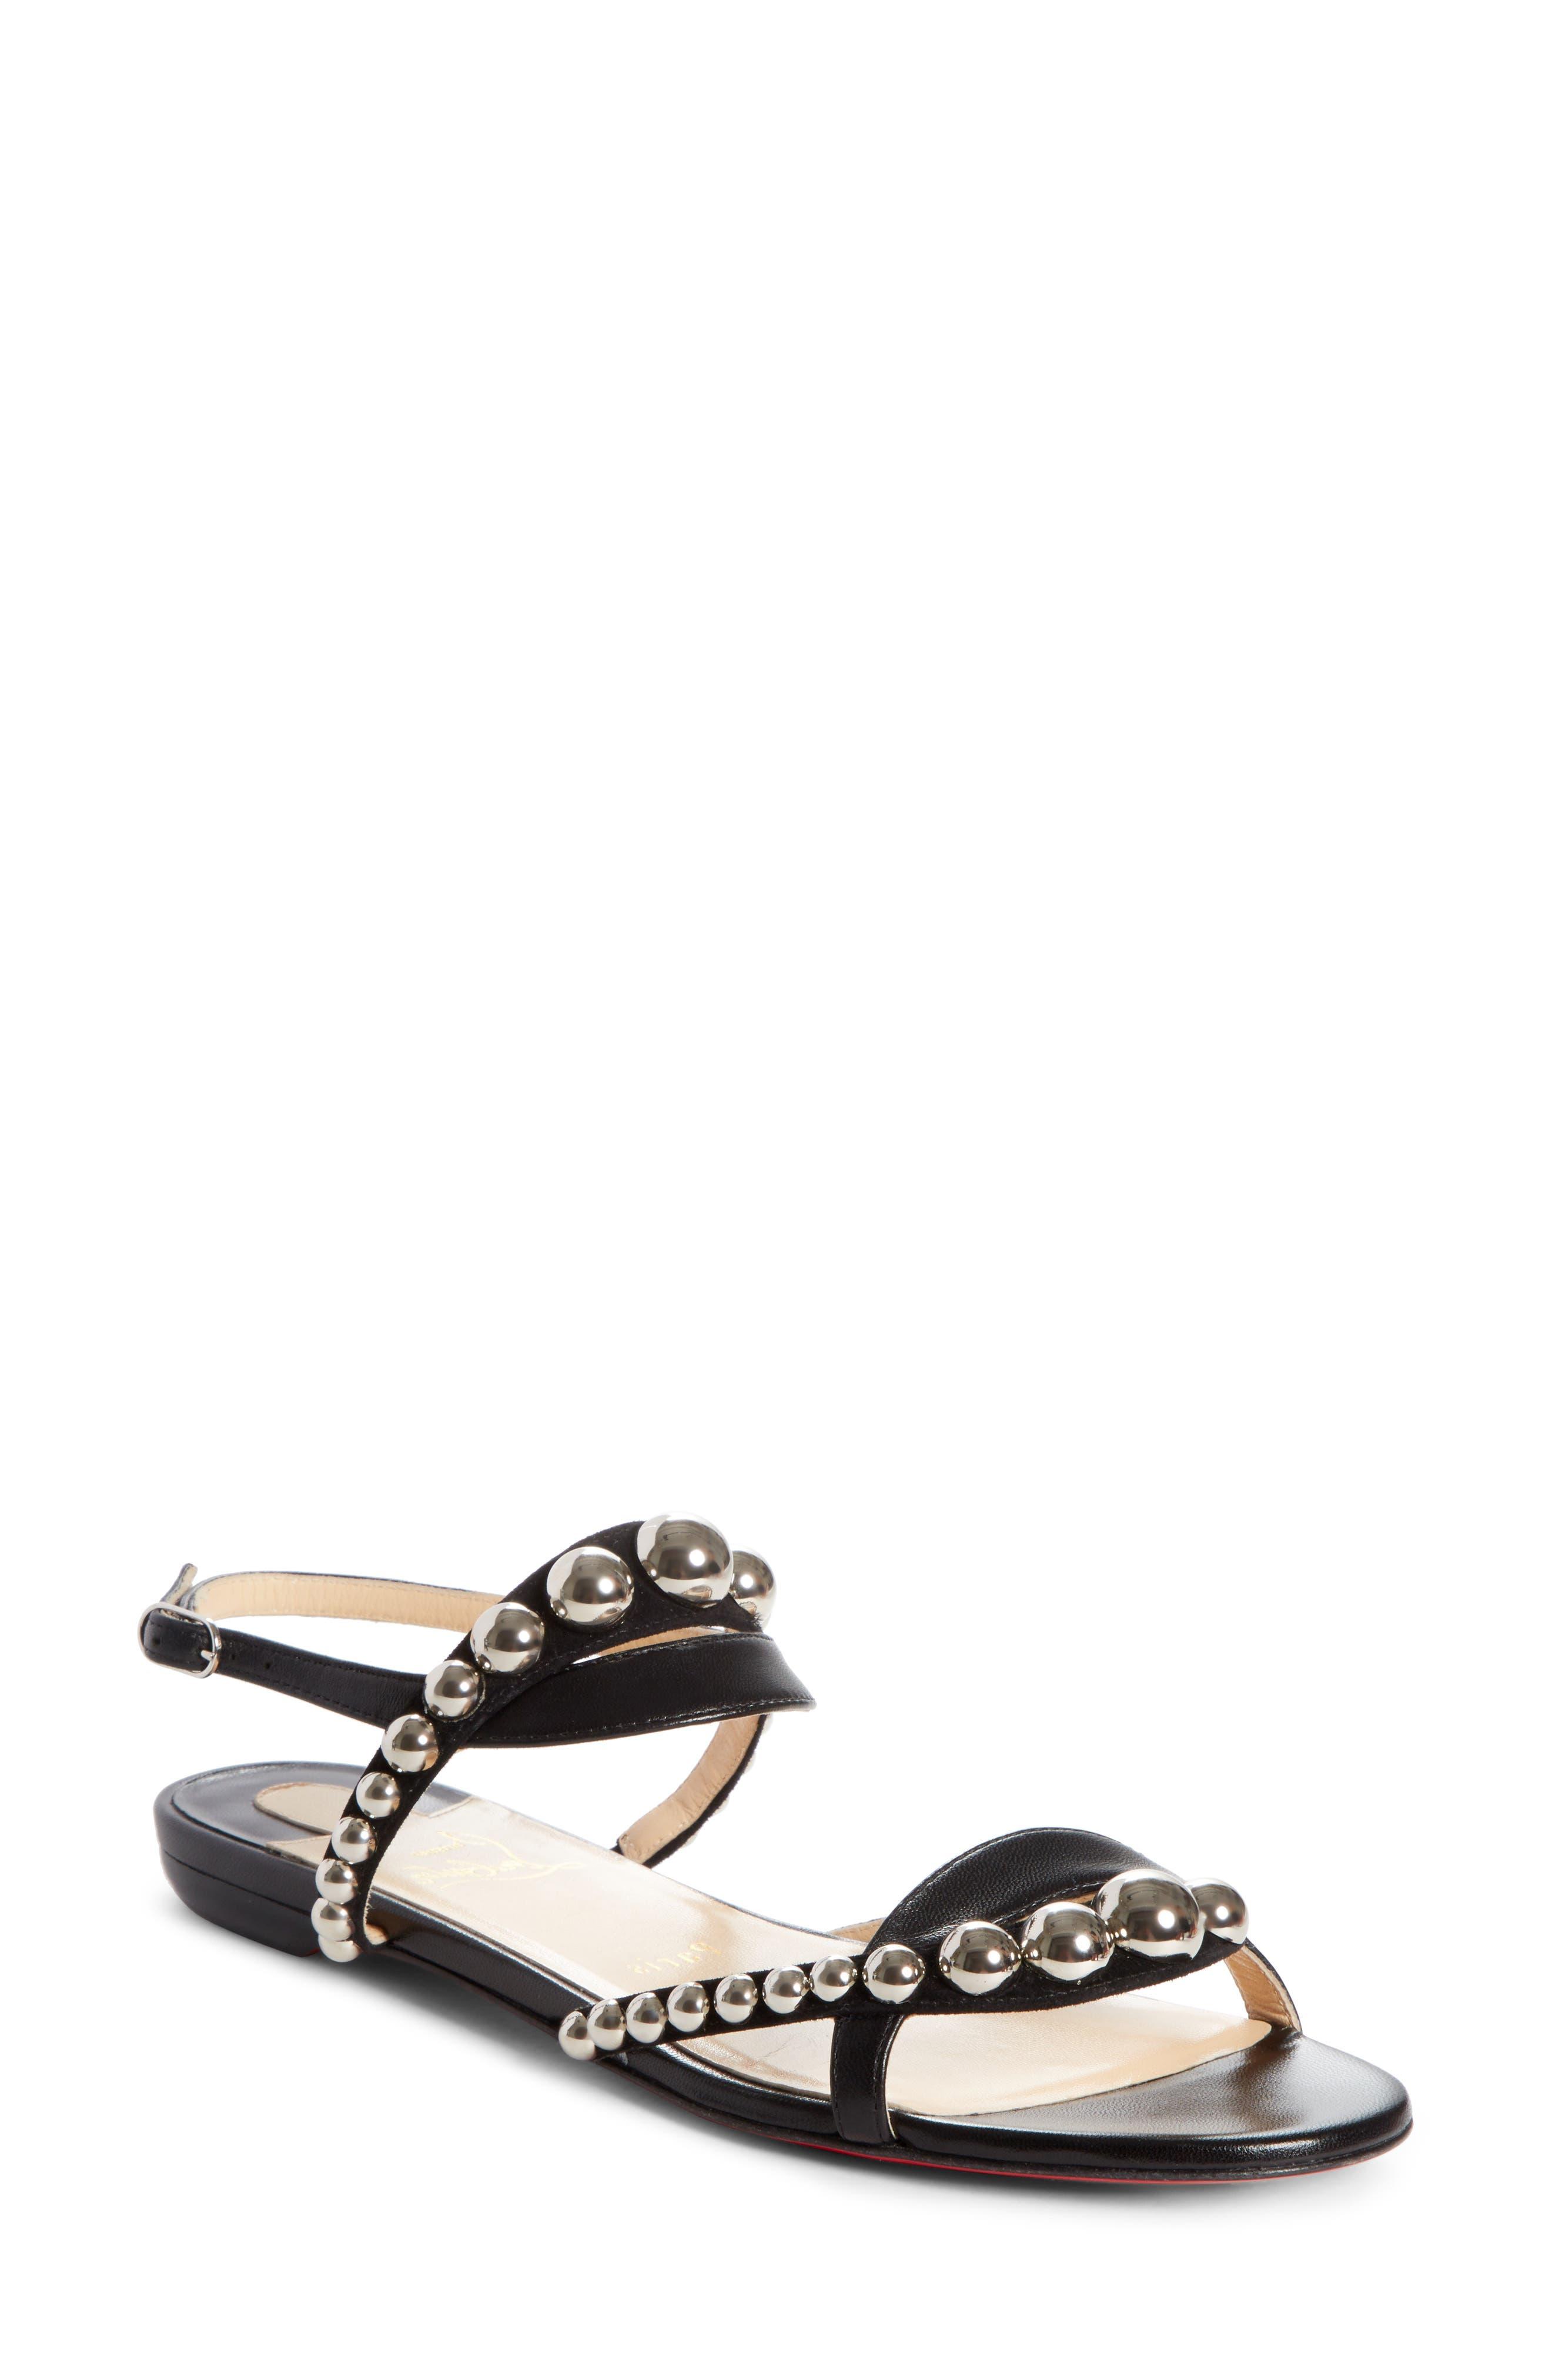 Galeria Ornament Flat Sandal,                             Main thumbnail 1, color,                             BLACK/ SILVER